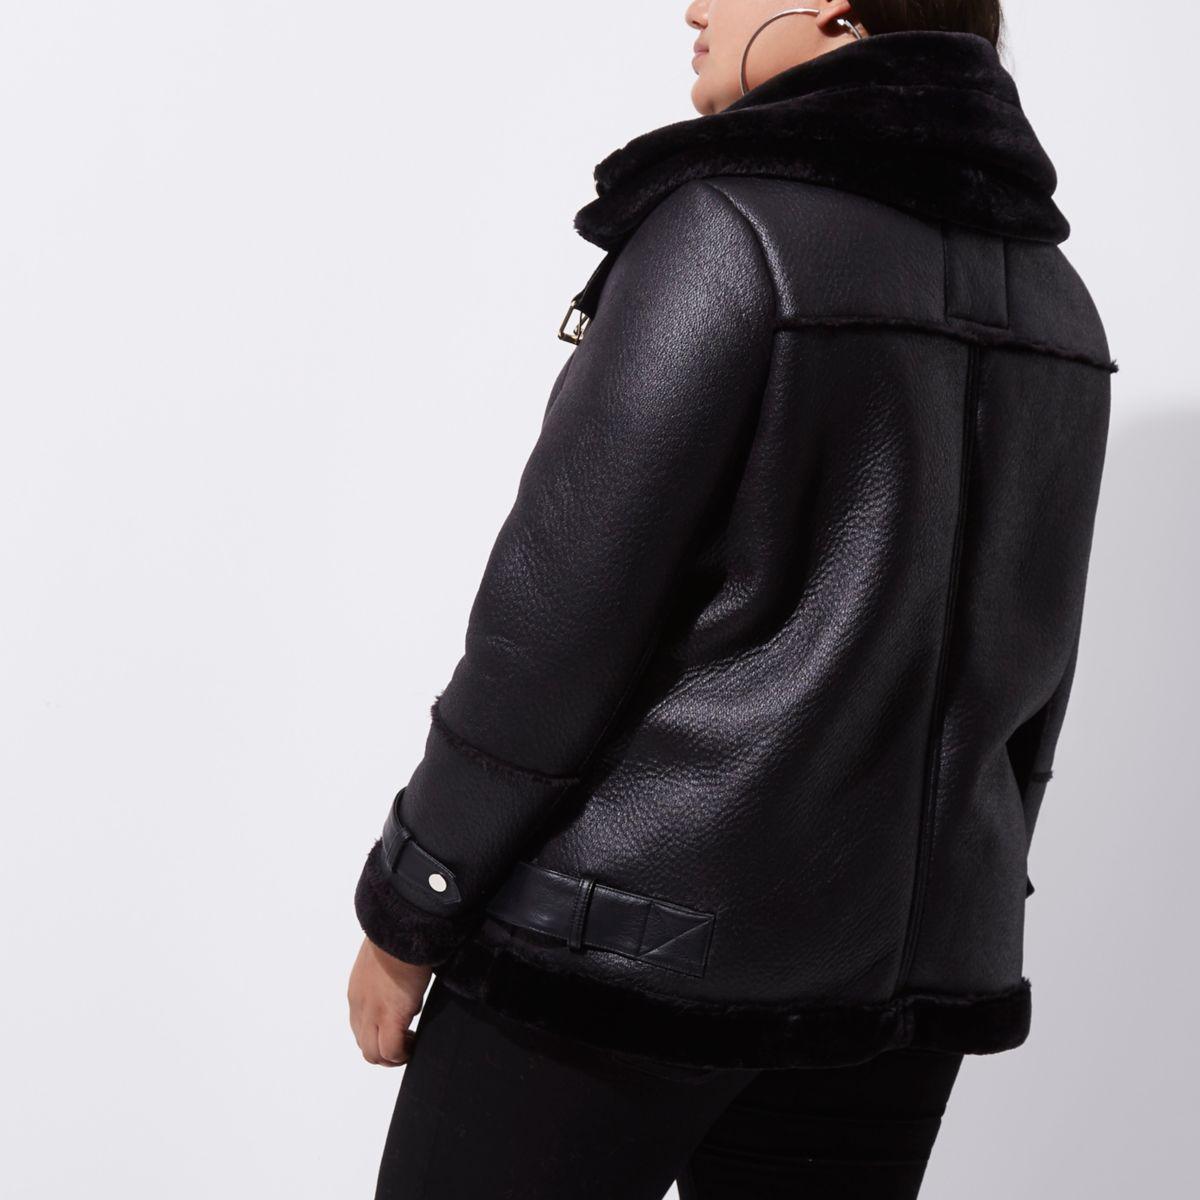 River Island Black Leather Hooded Jacket